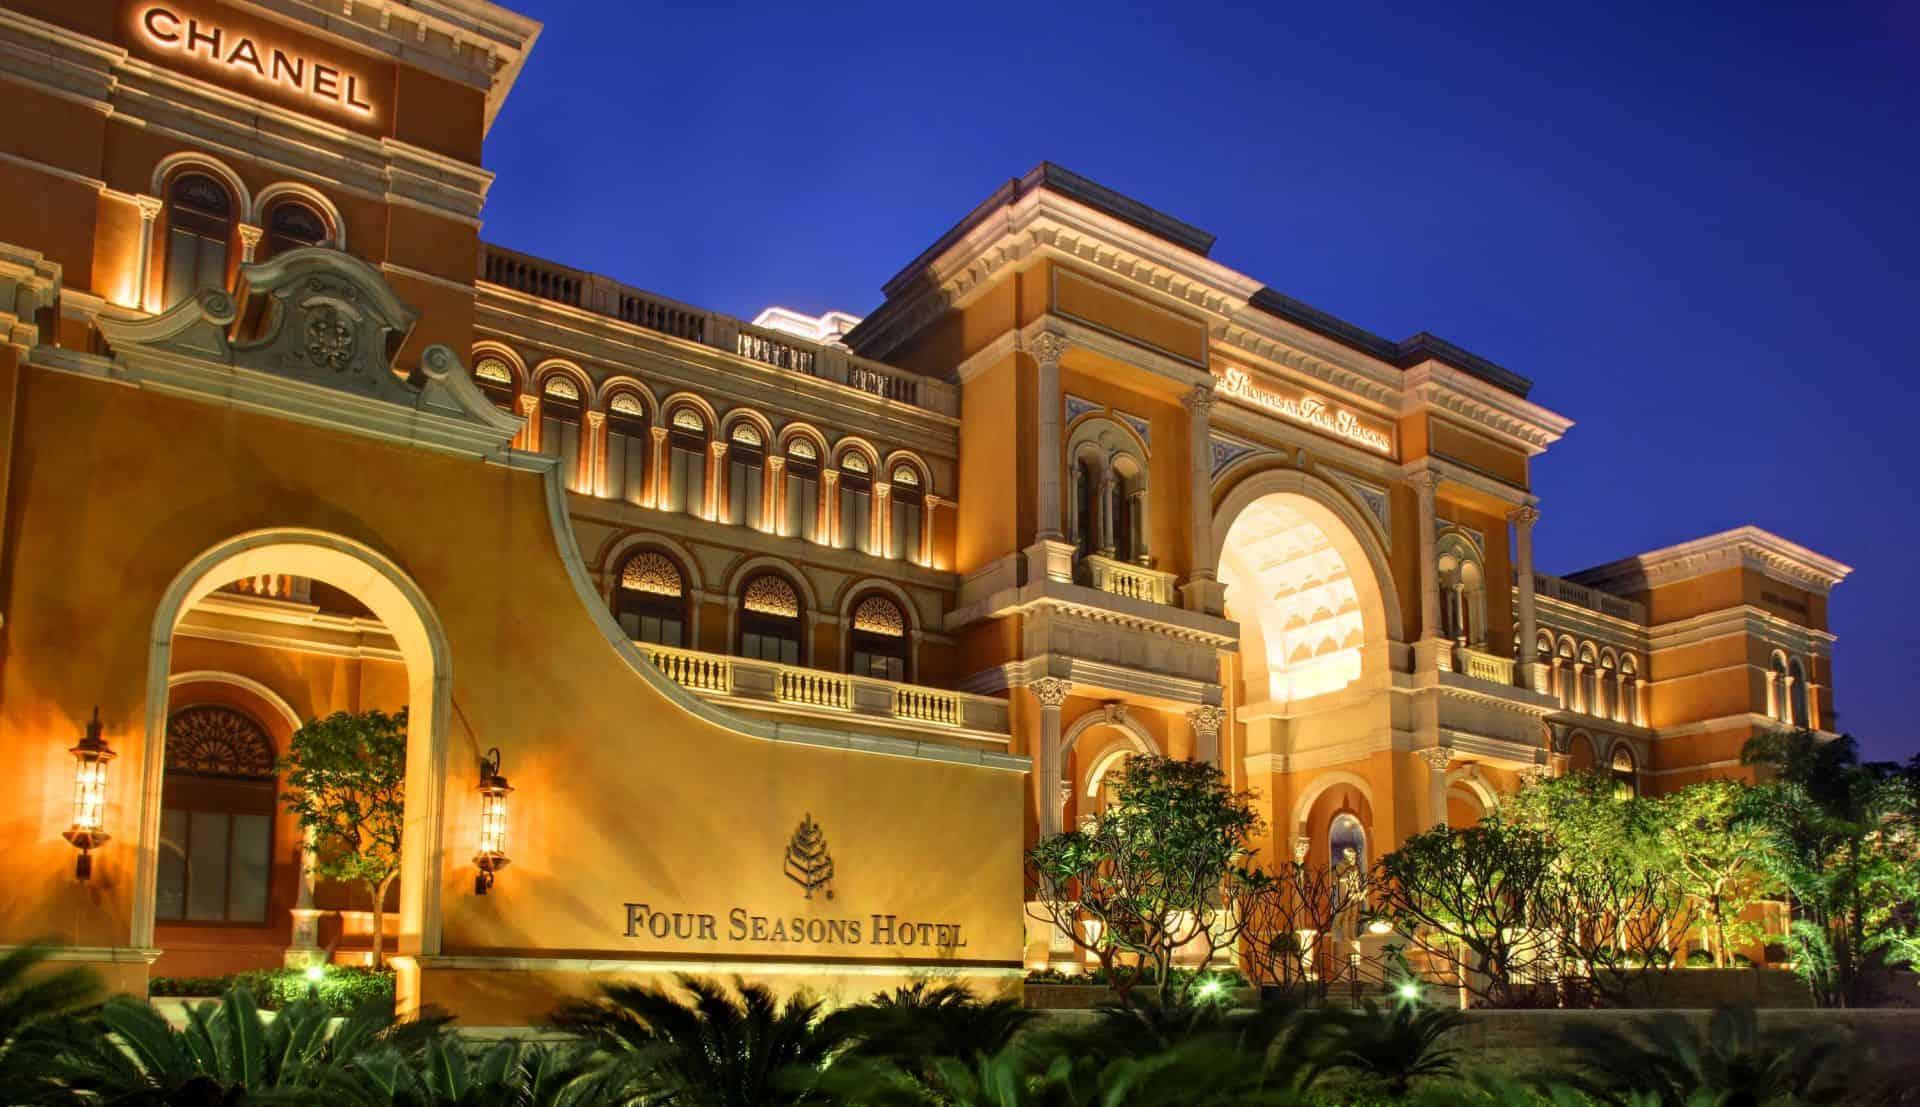 Four Seasons Hotel Macau